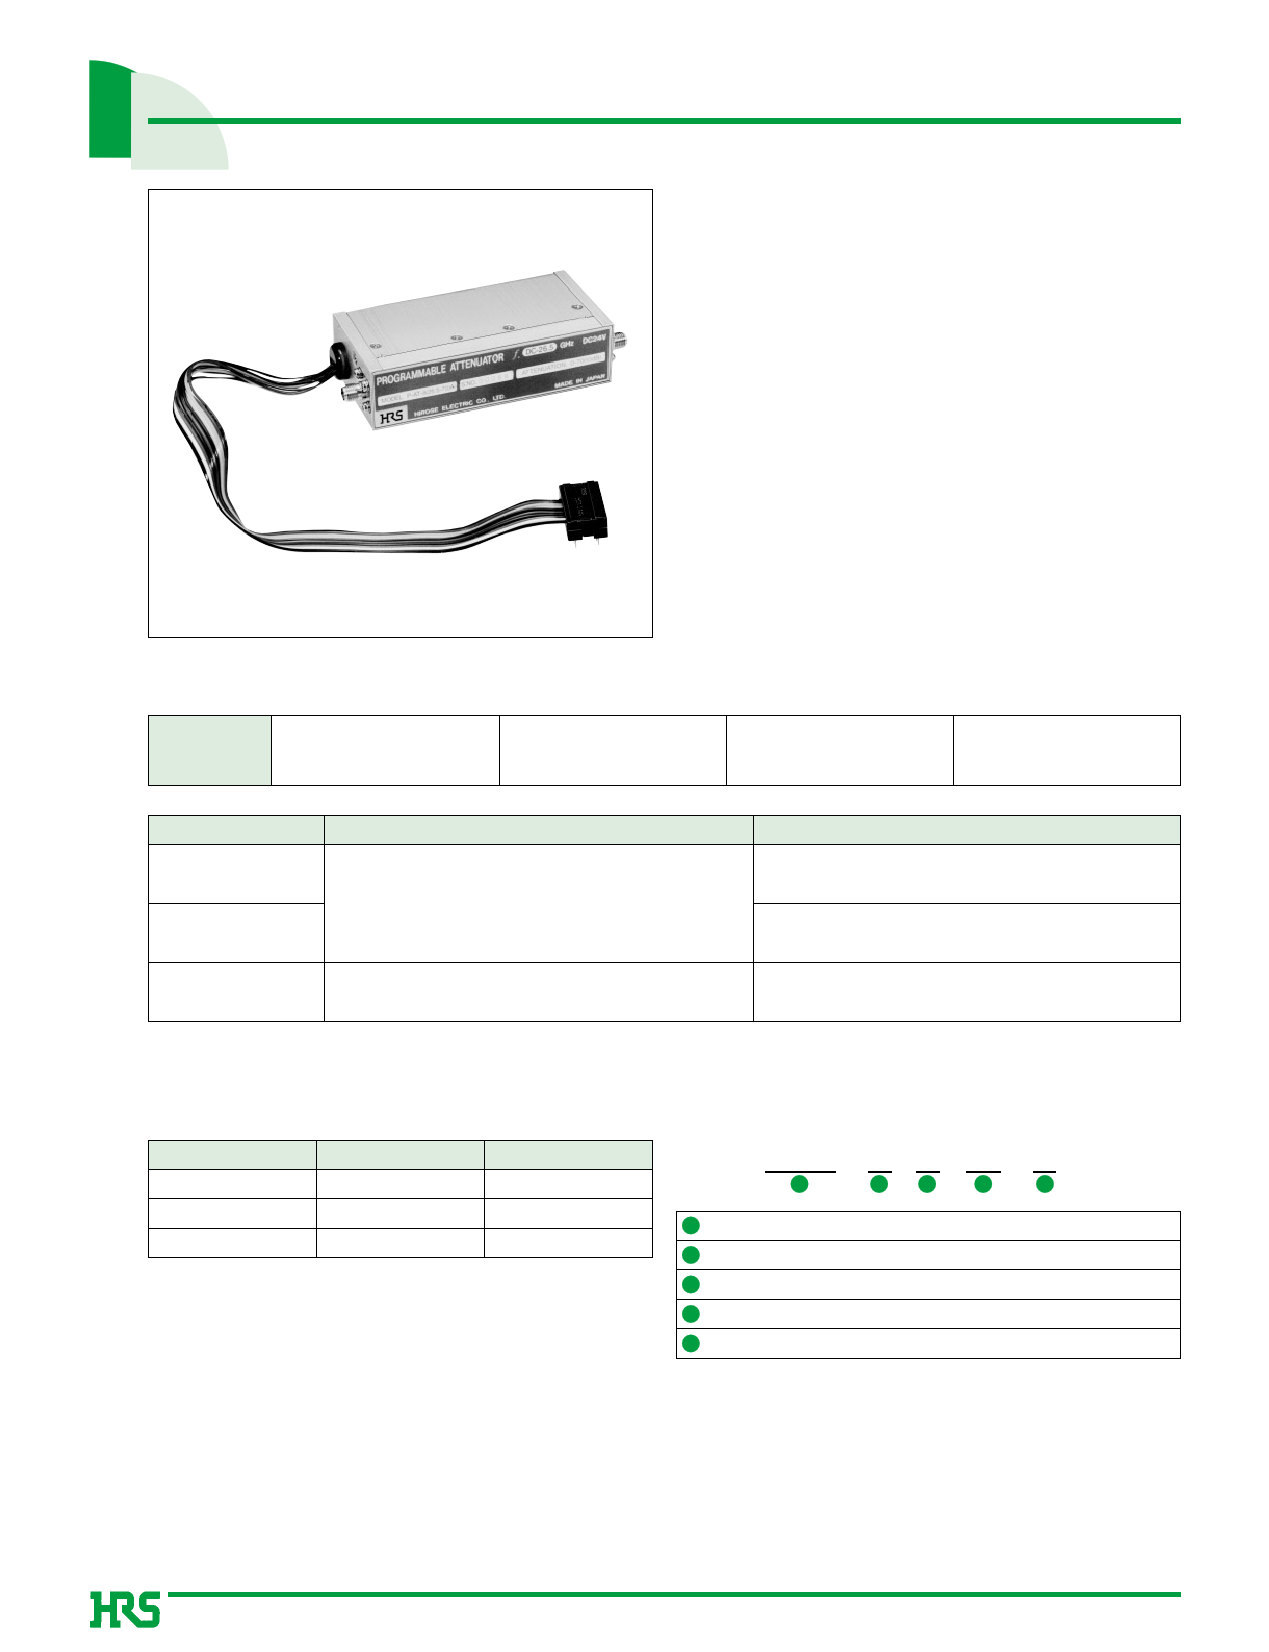 P-AT-6 datasheet